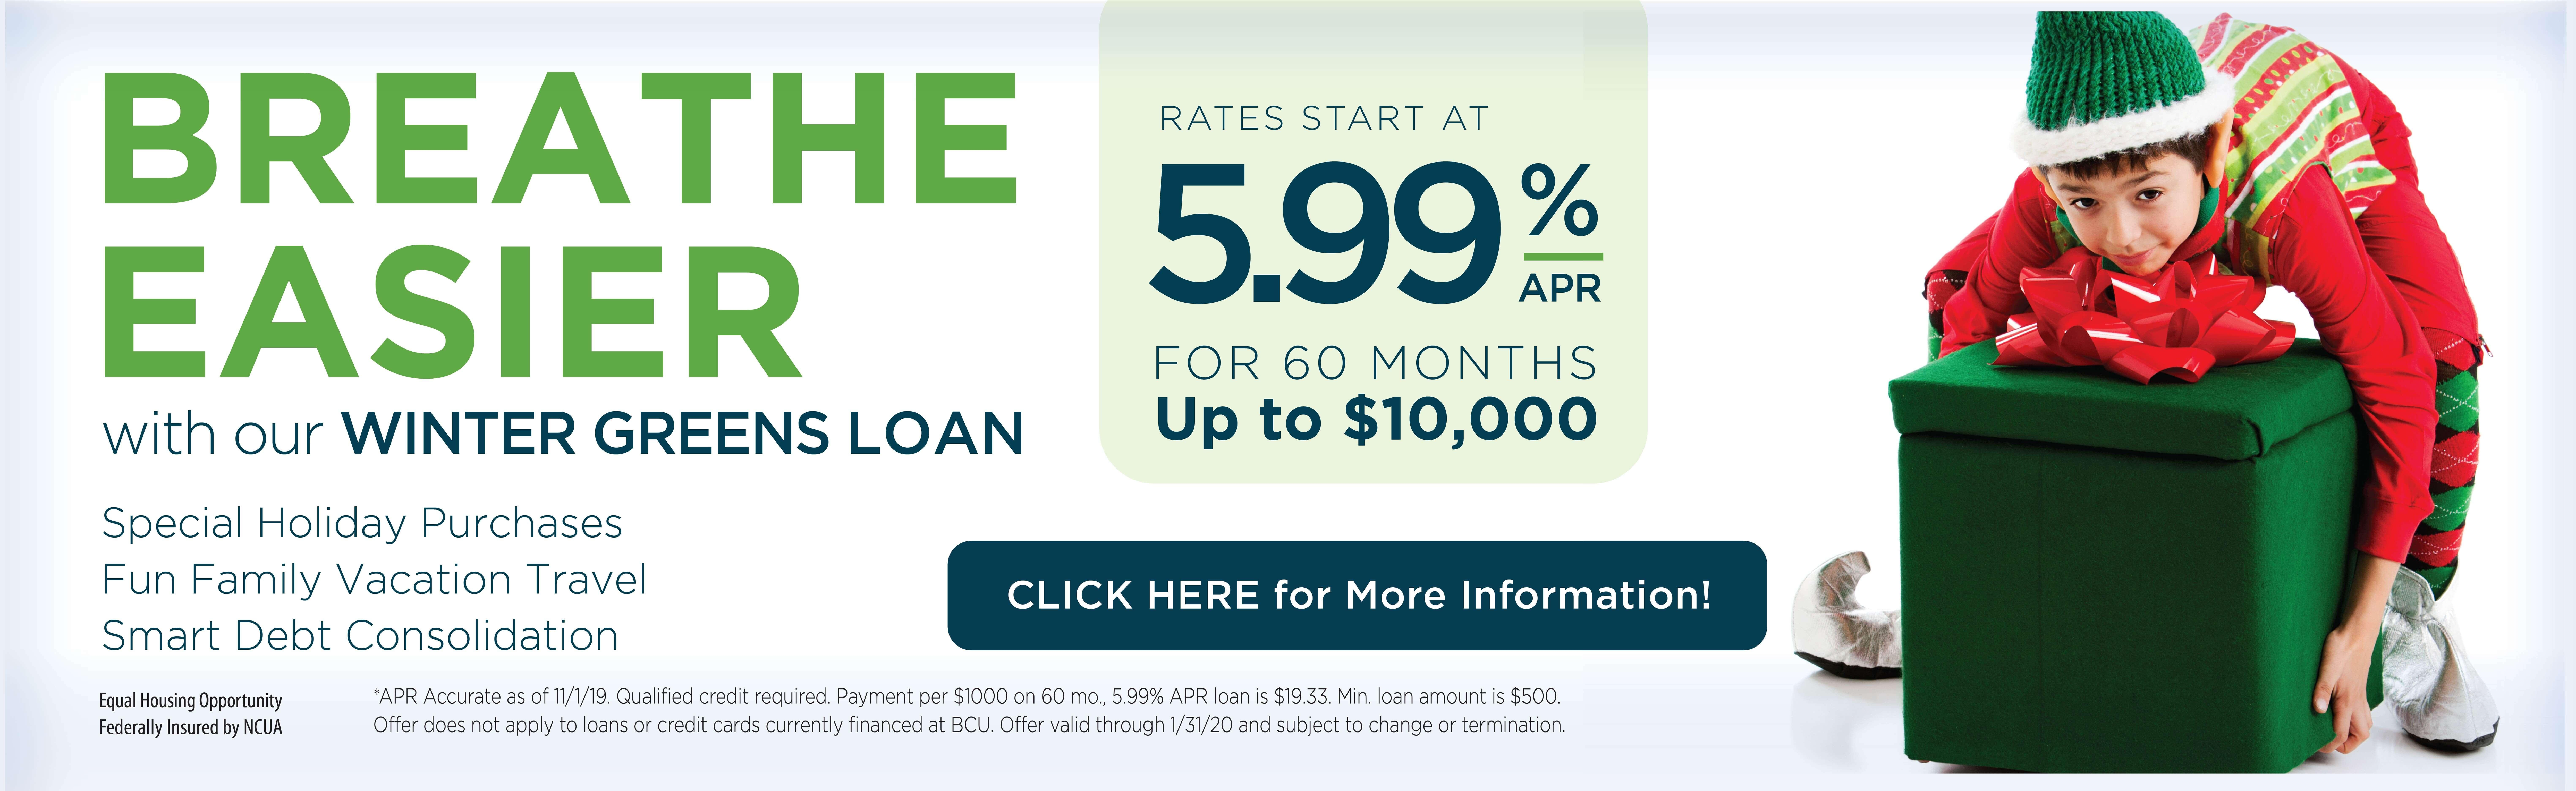 Winter Greens Loan Special